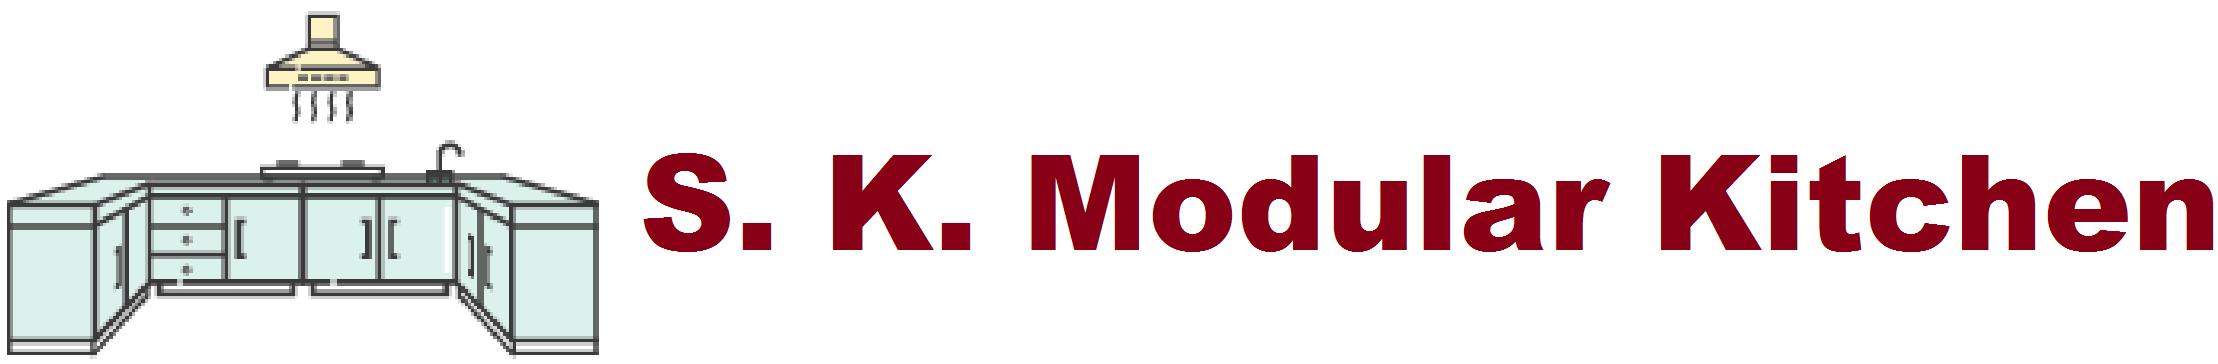 SK  Modular Kitchen